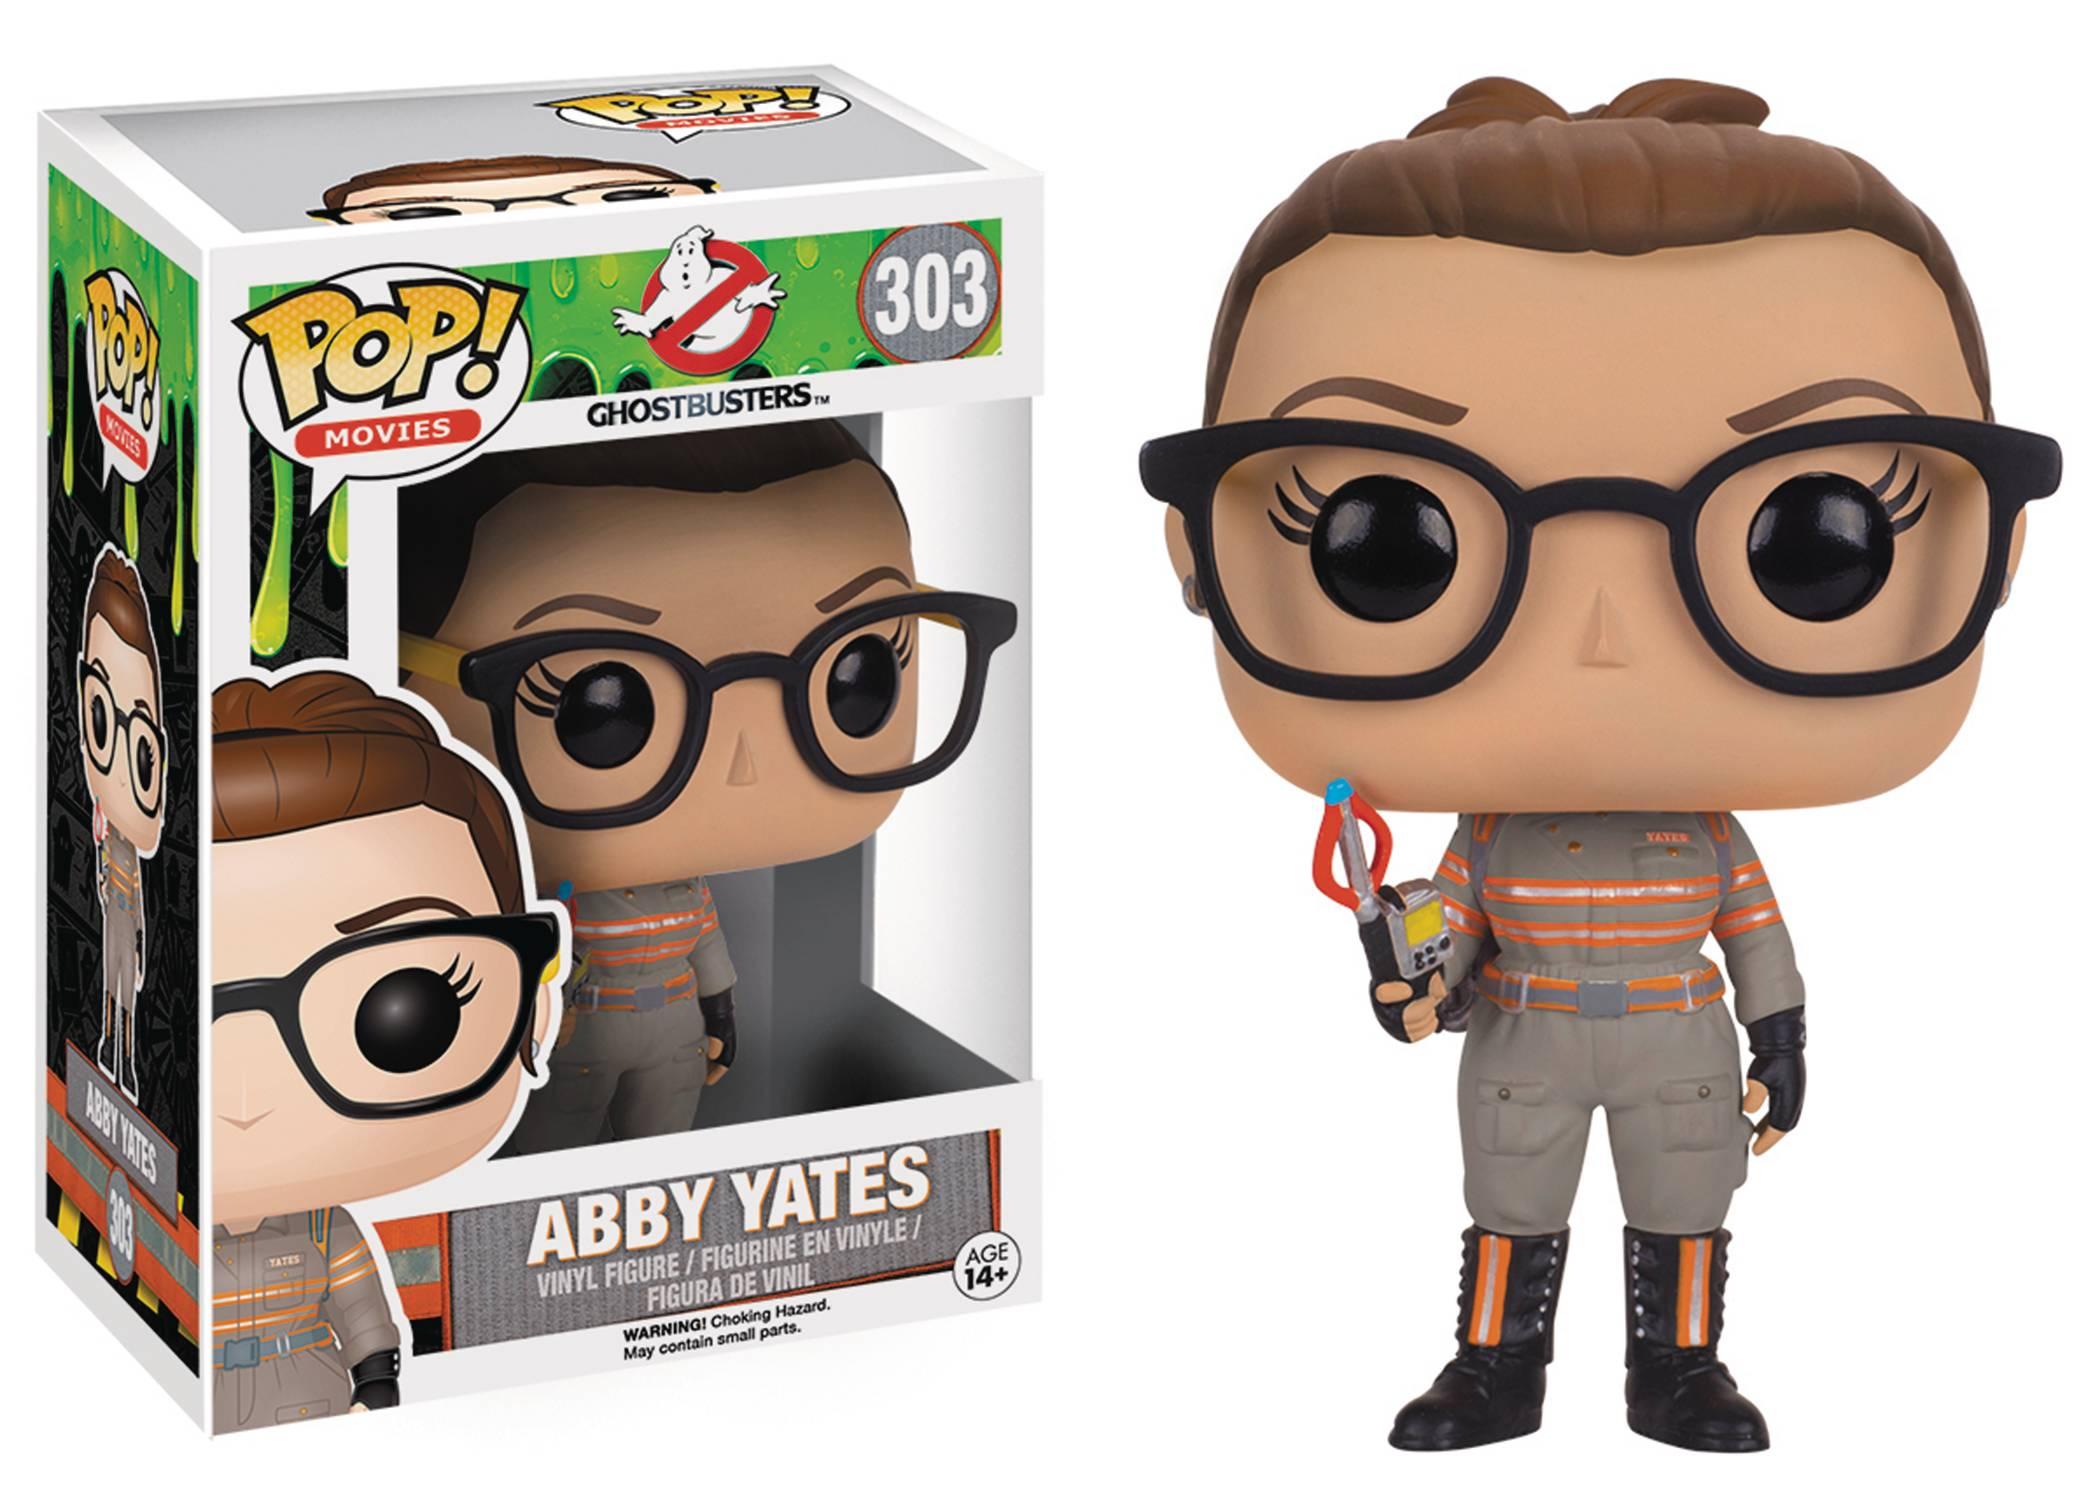 POP Ghostbuster 2016 Abby Yates Vinyl Figure